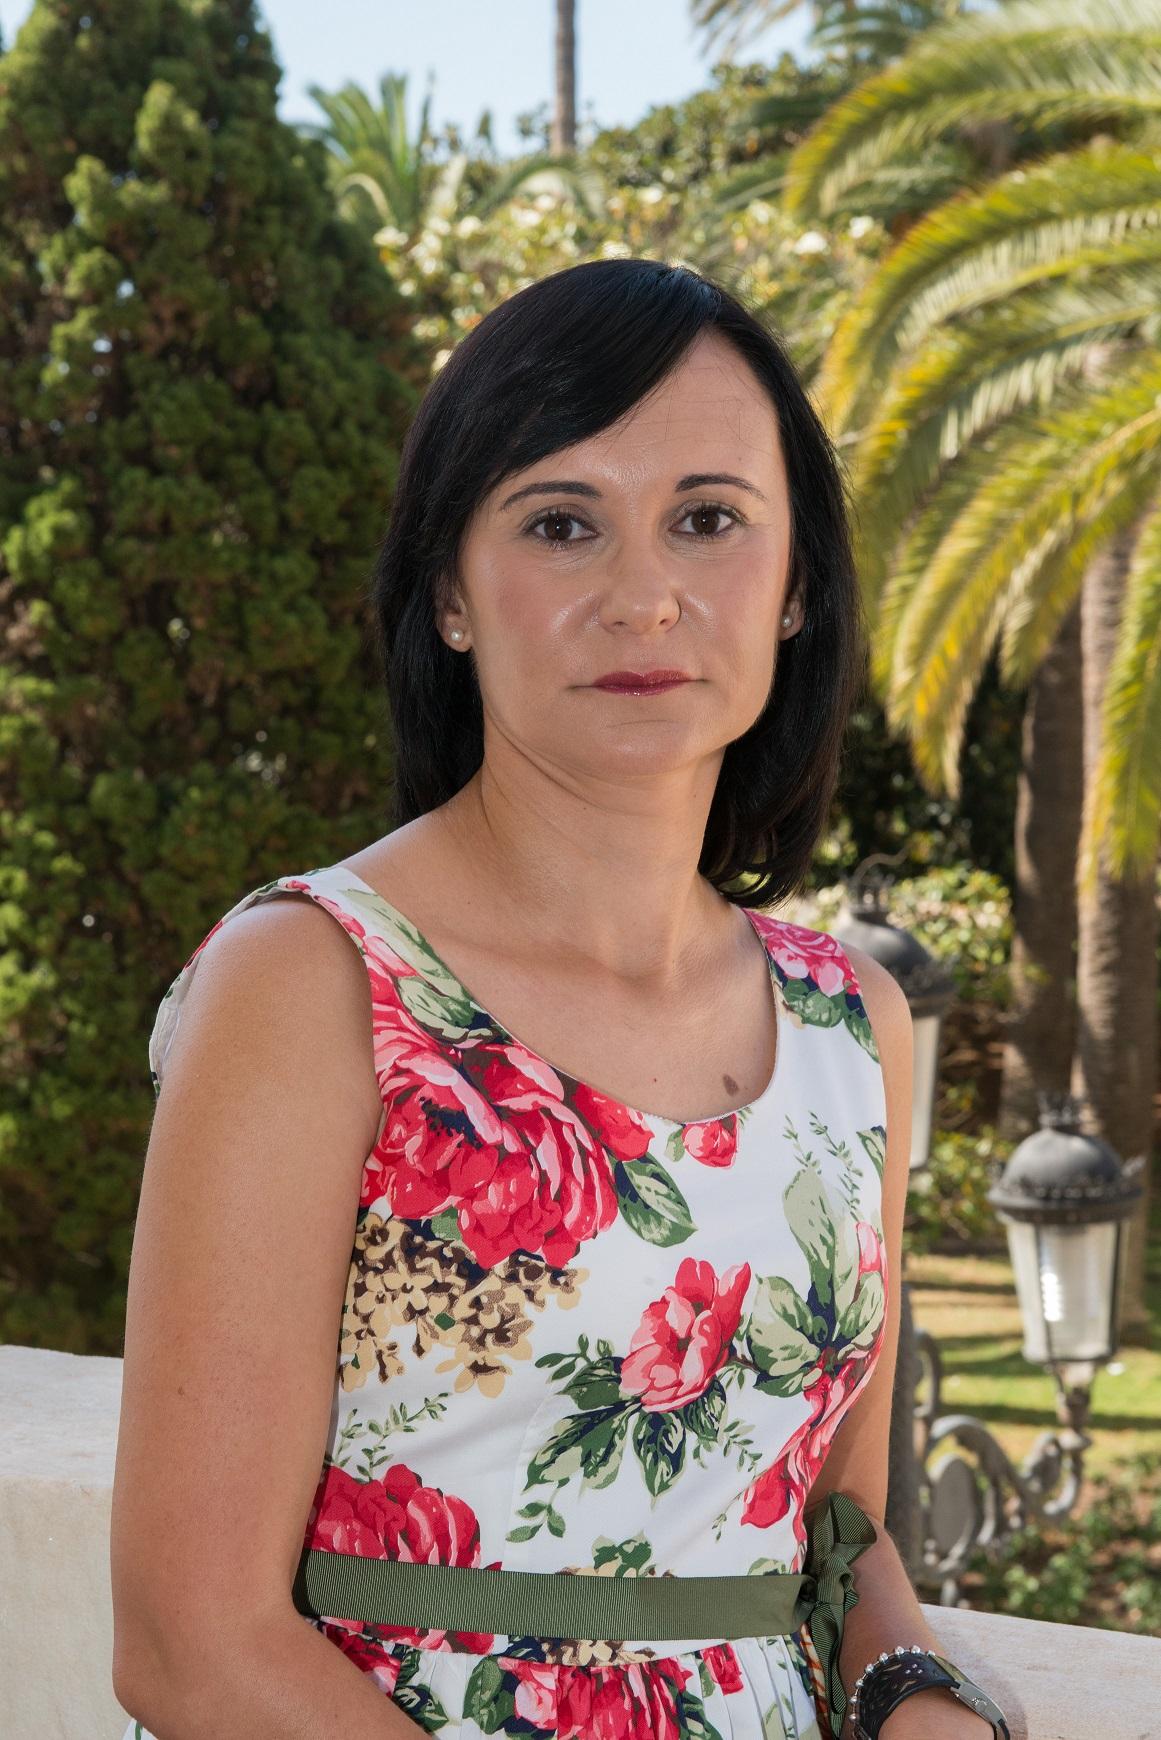 Sra. Dª. Isabel García García